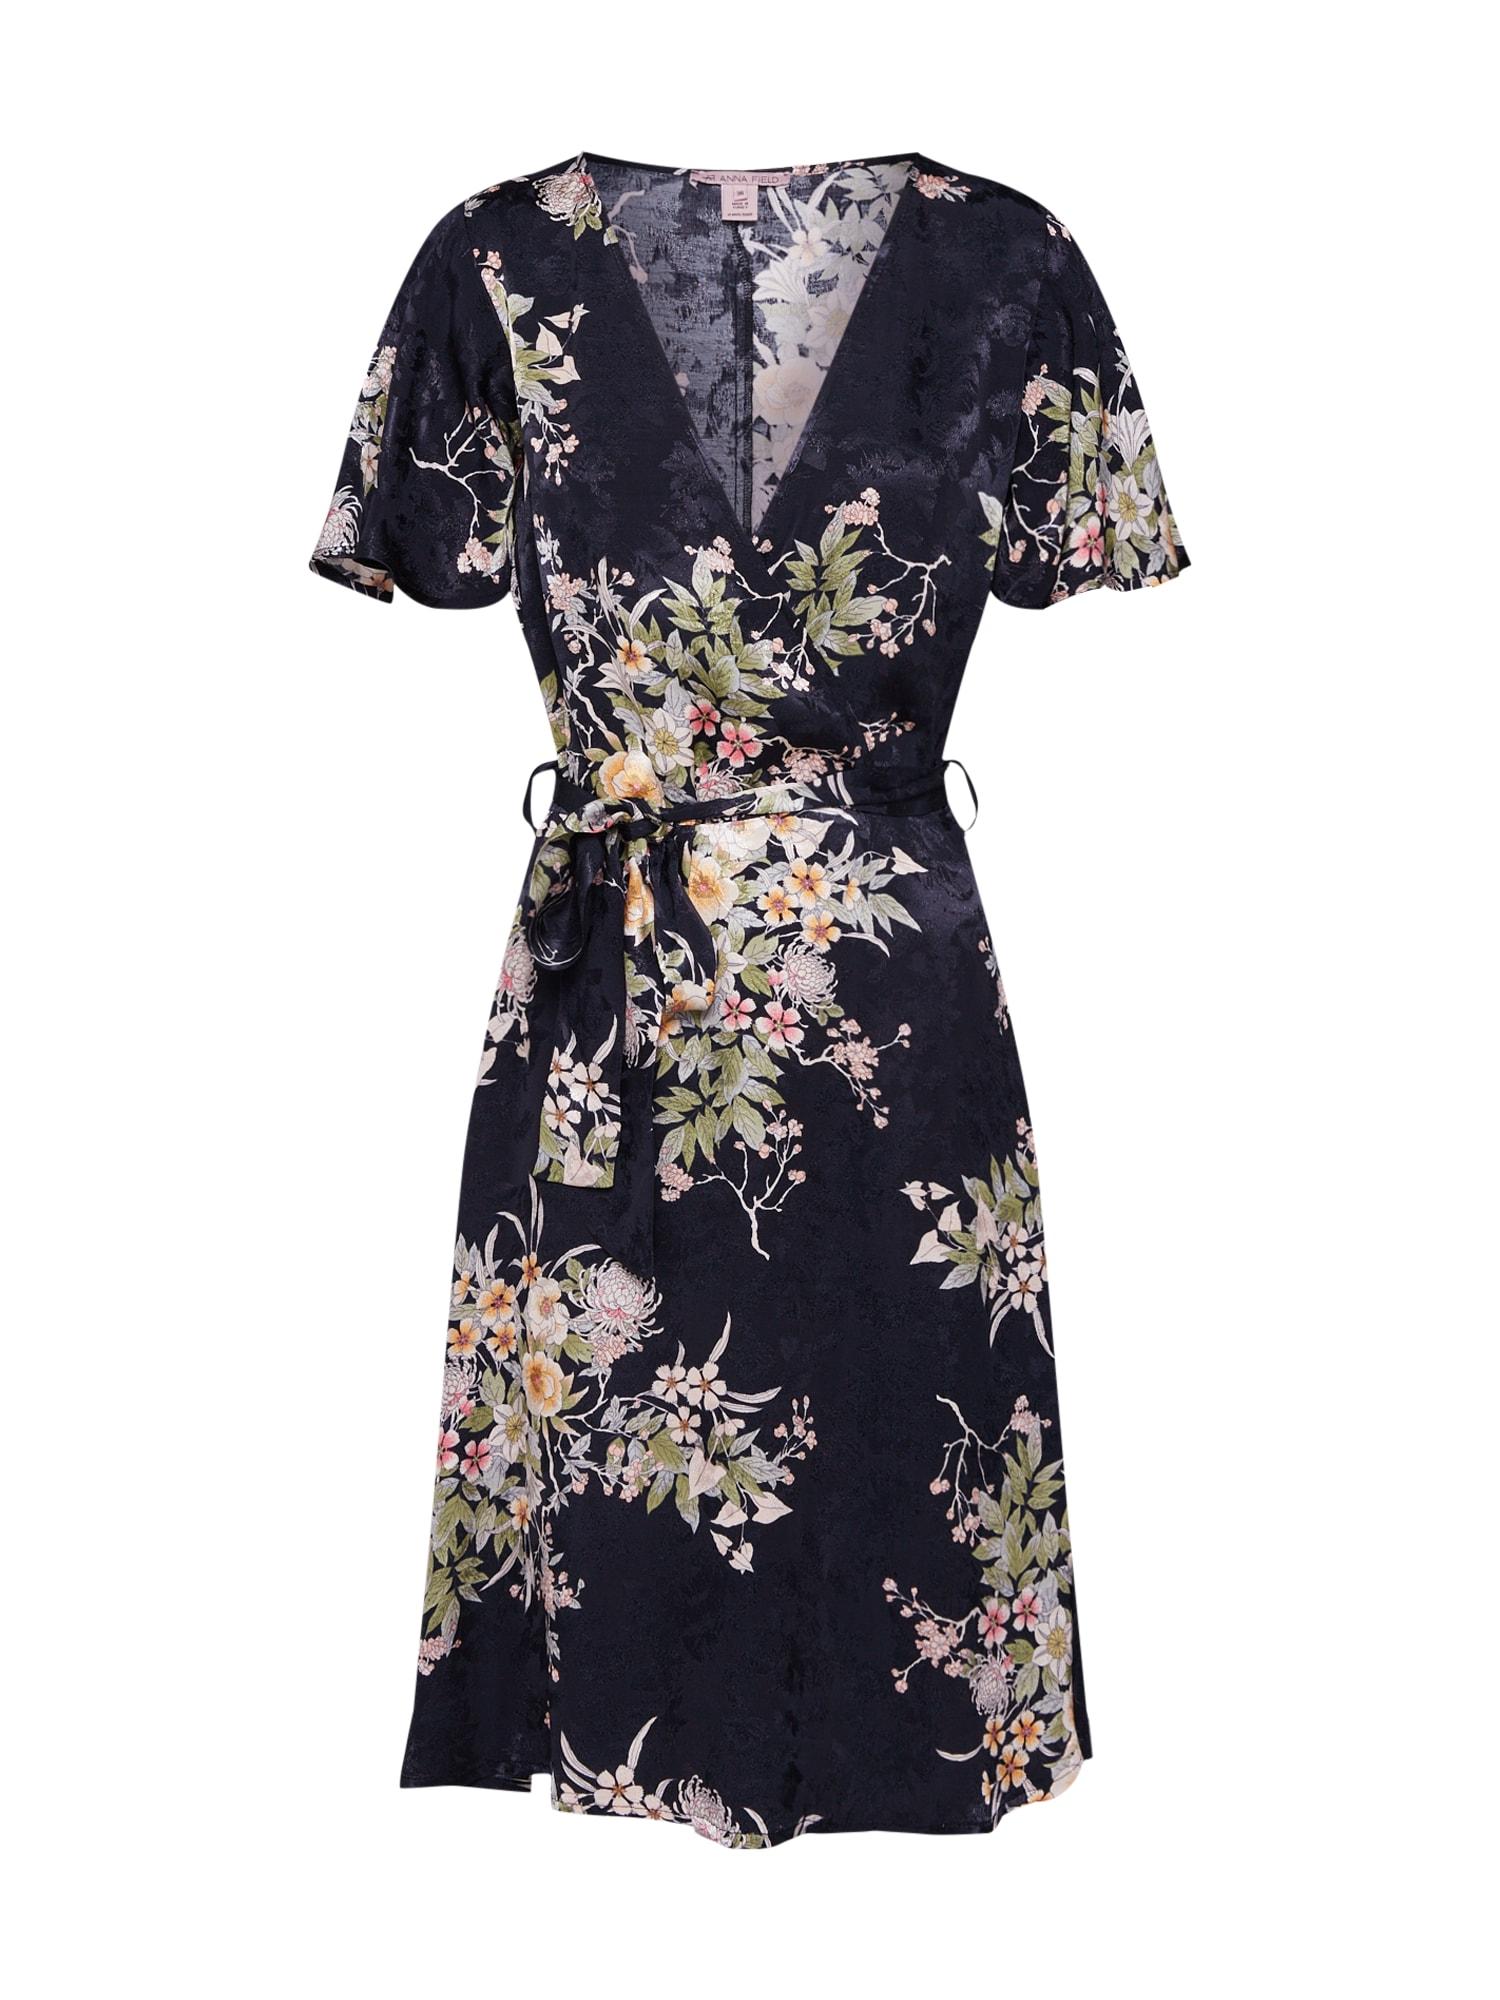 Šaty floral wrap dress tmavě modrá bílá Anna Field